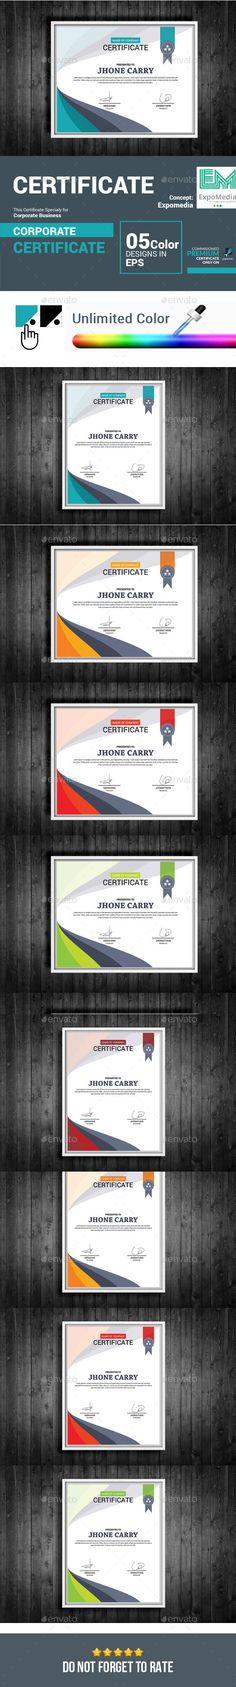 Certificate Design Certificate design, Certificate templates and - certificate template software